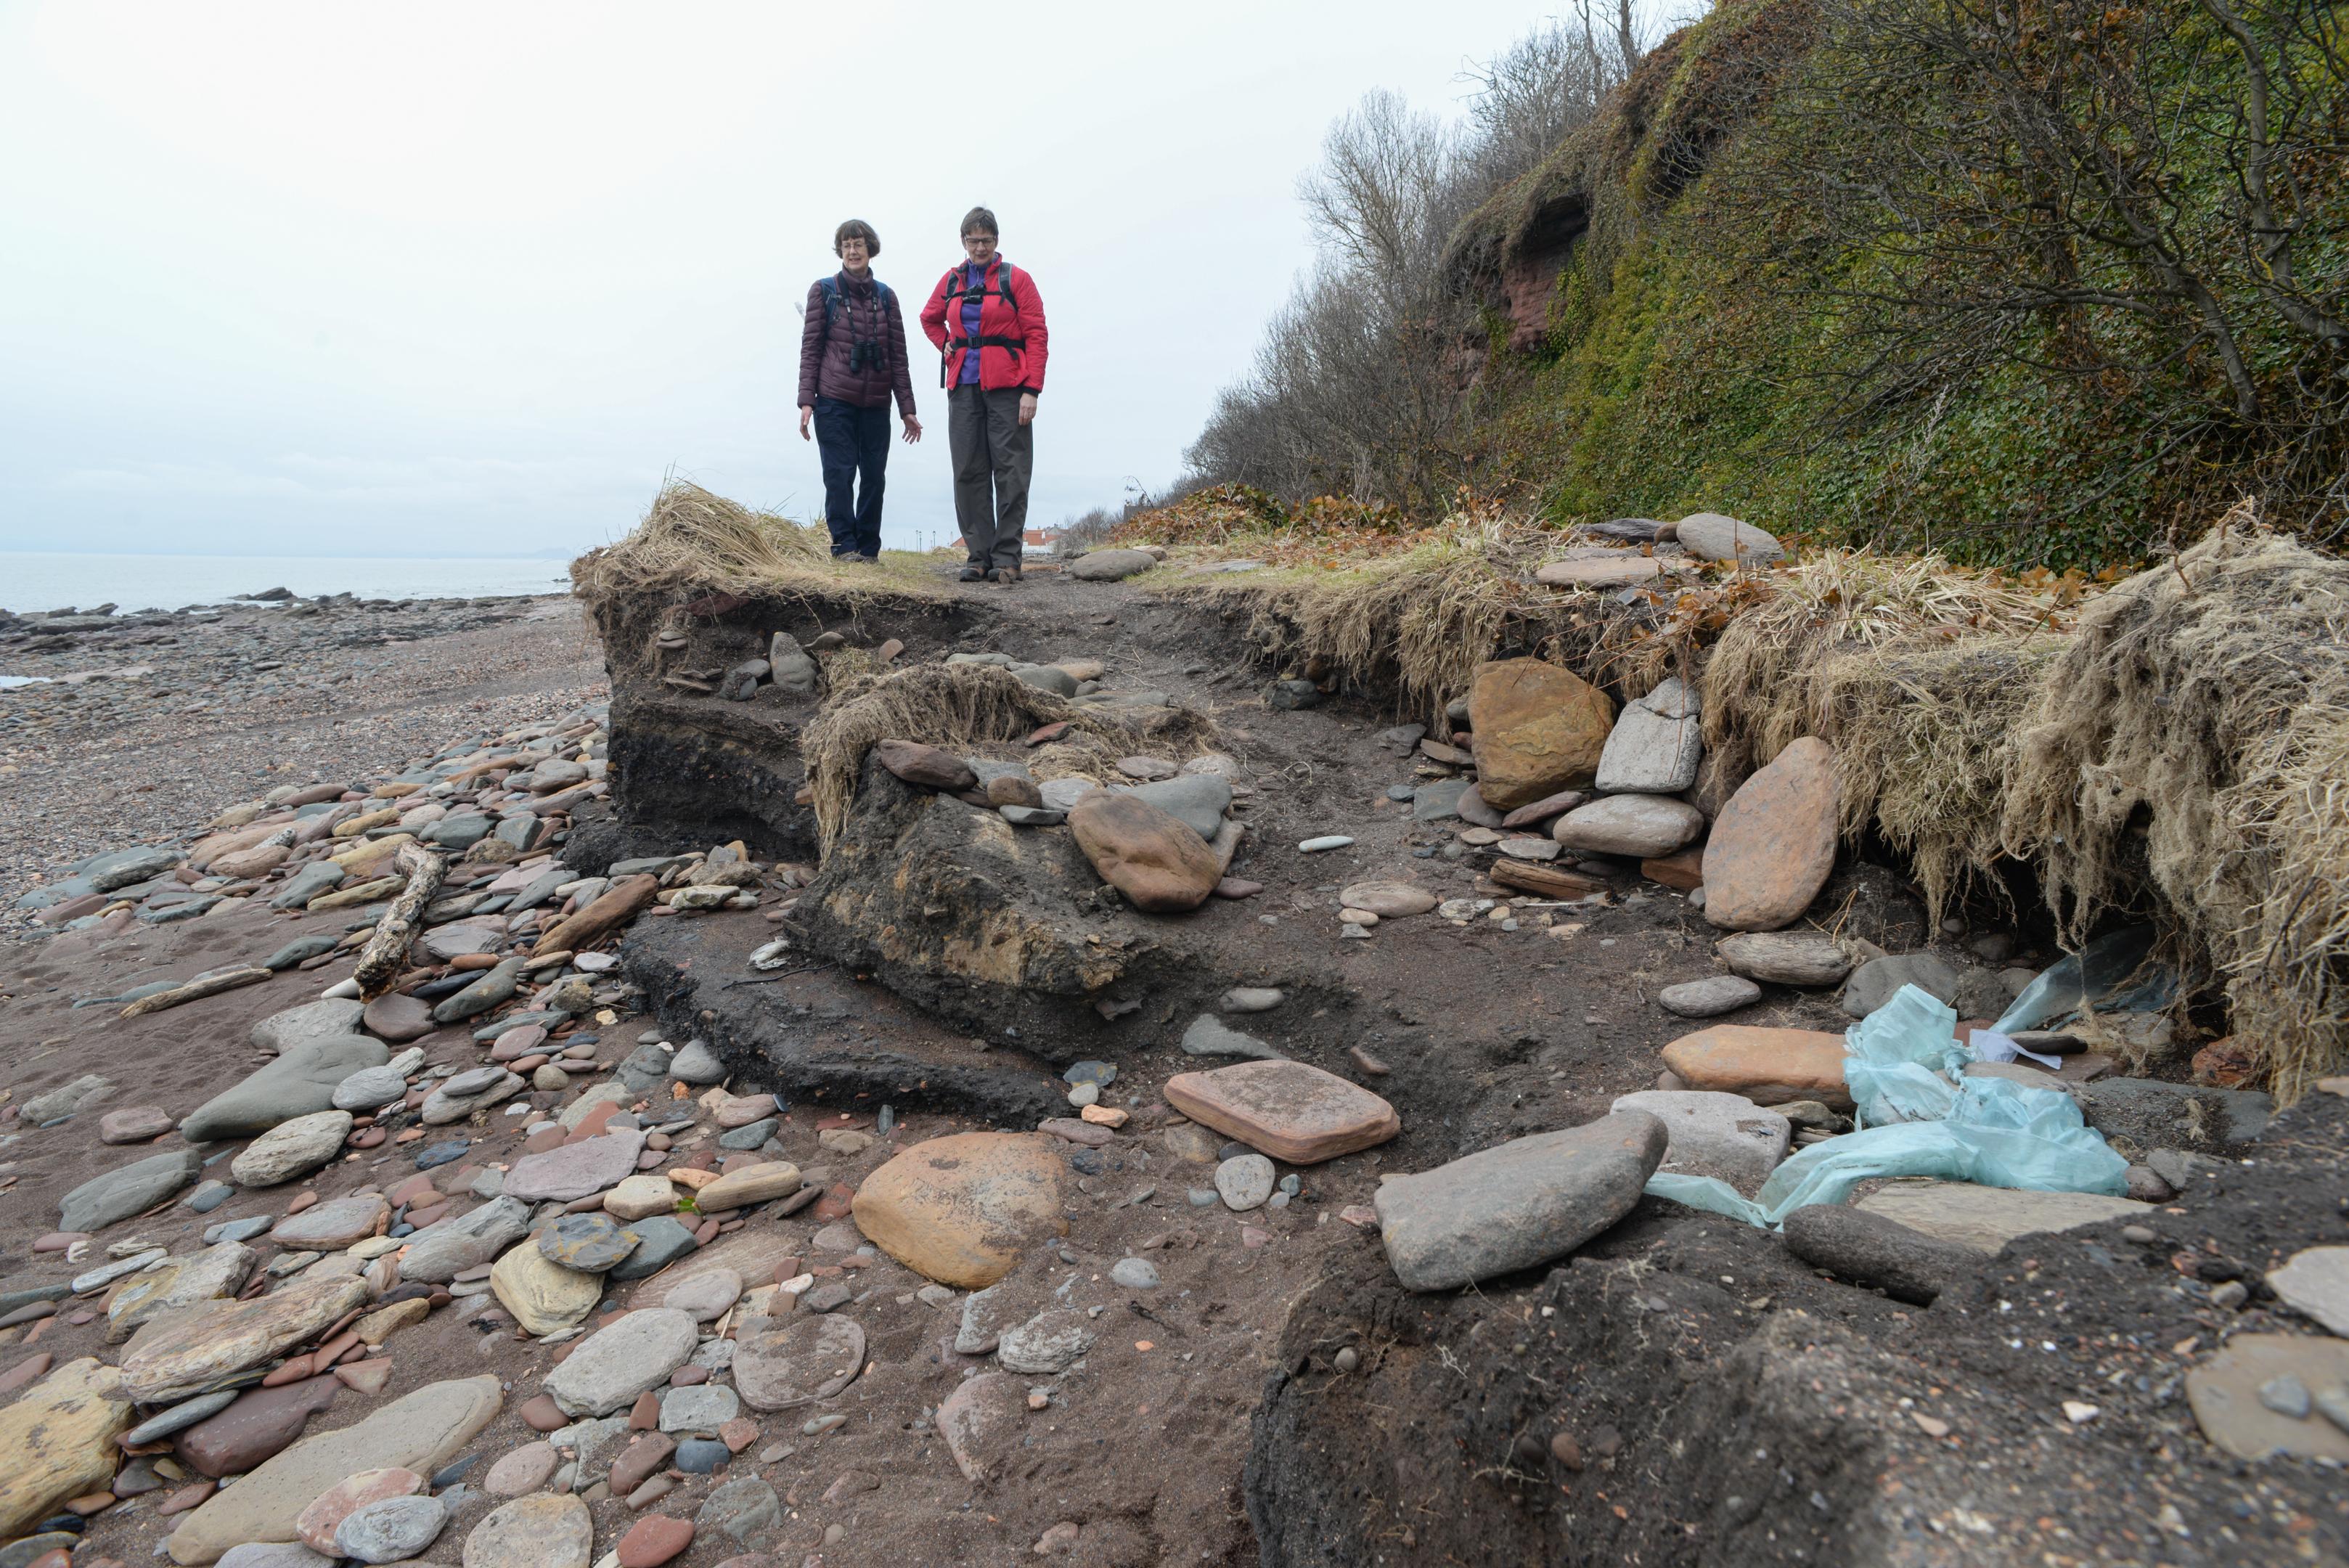 Walkers encounter Coastal Path erosion at West Wemyss.